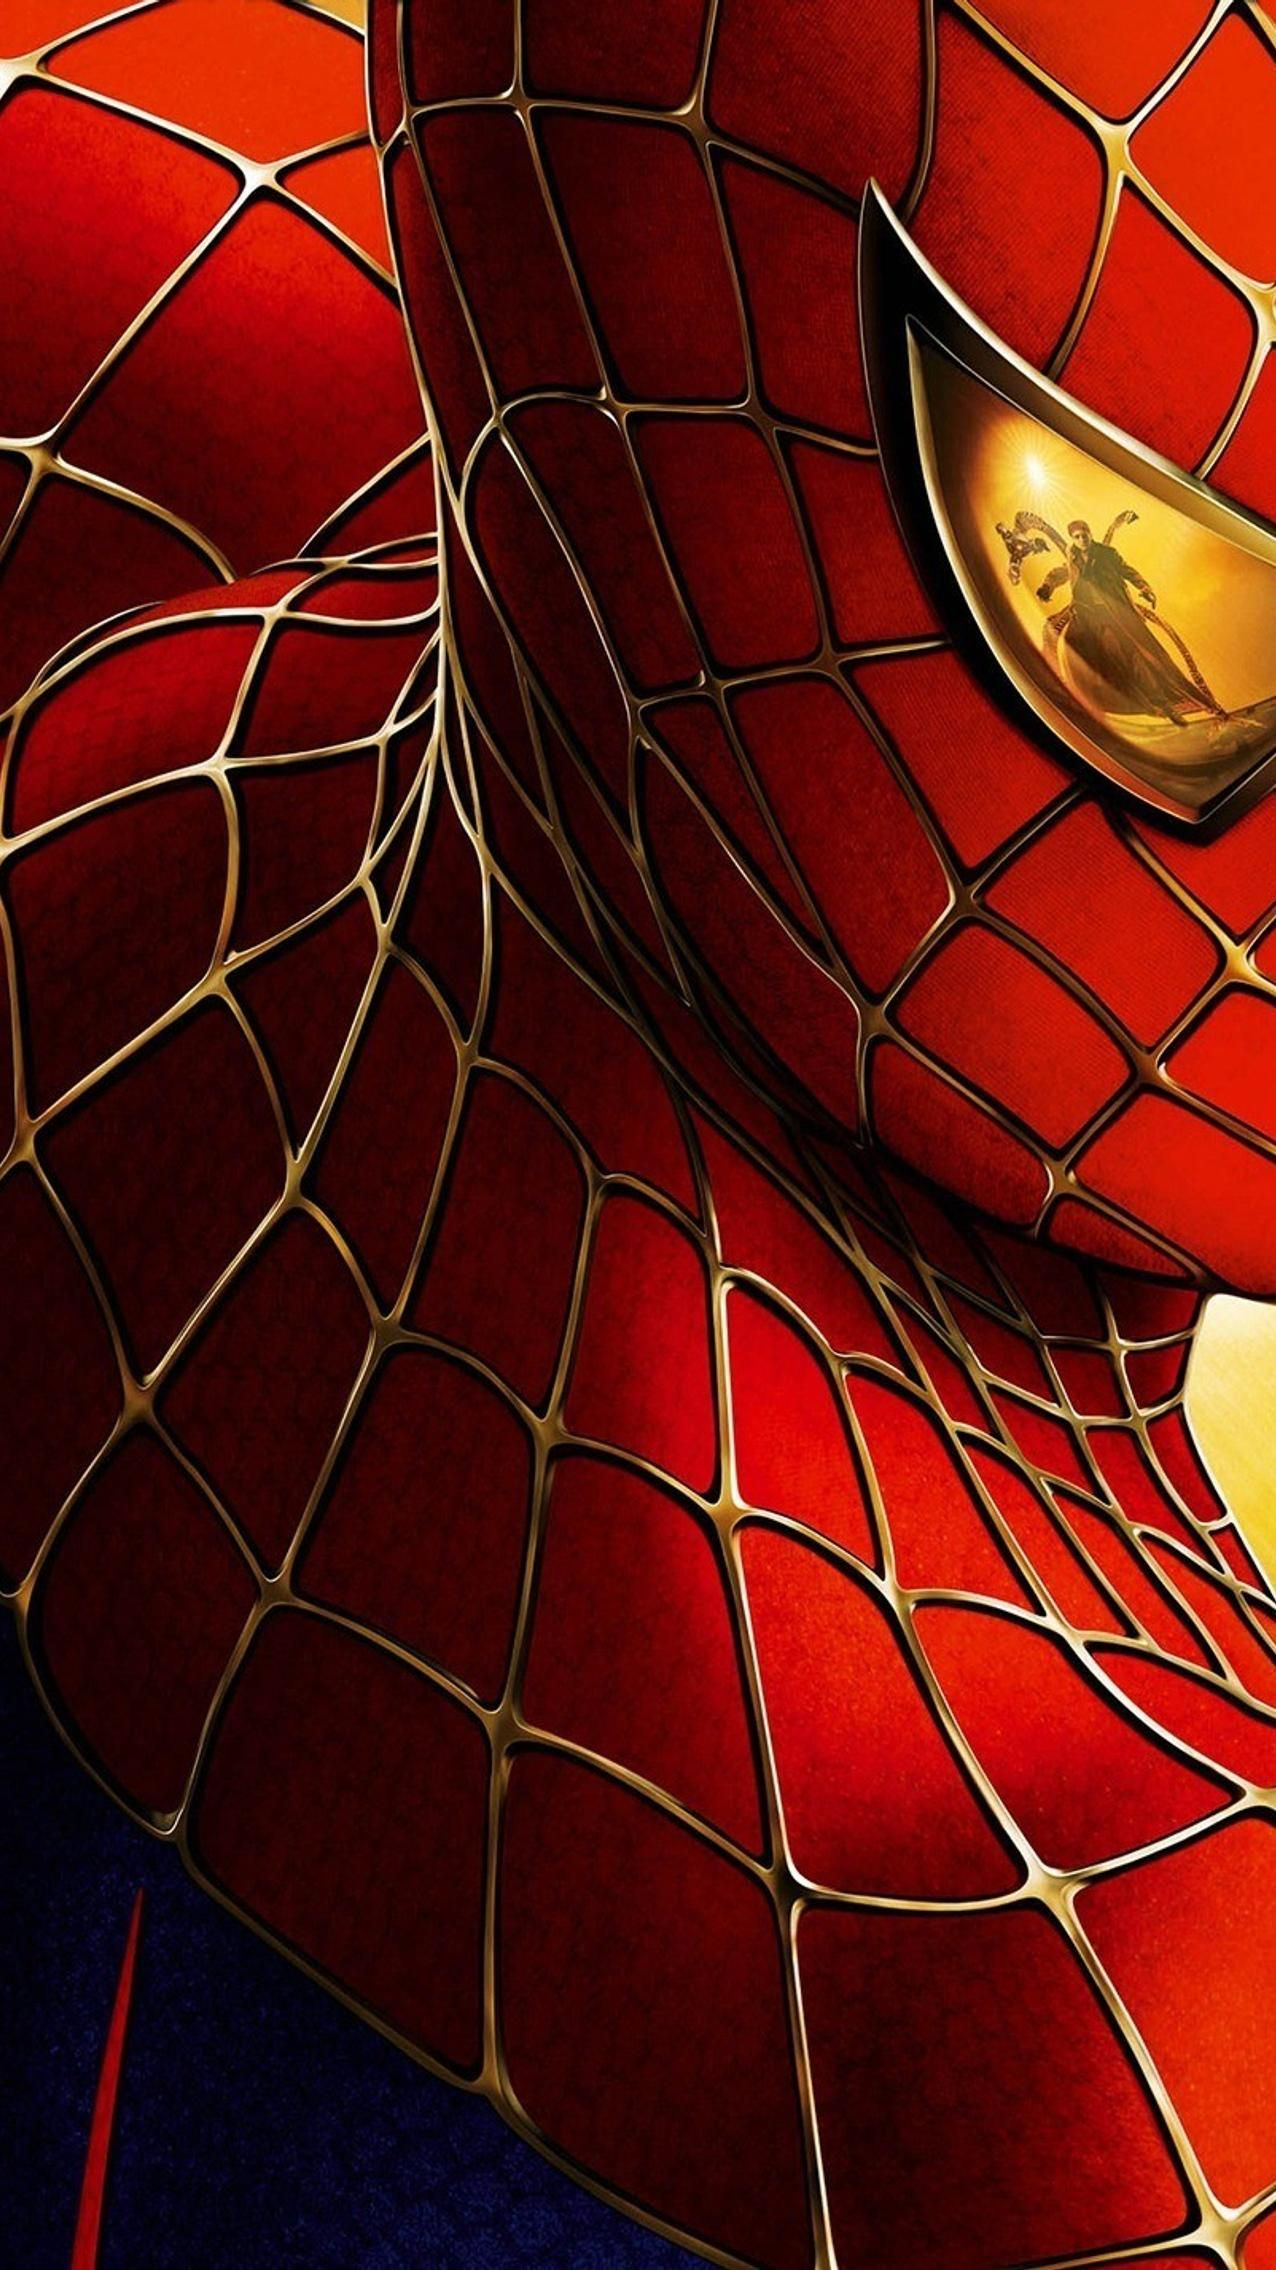 Spider Man 2 2004 Phone Wallpaper Moviemania Spiderman Amazing Spiderman Spiderman Artwork